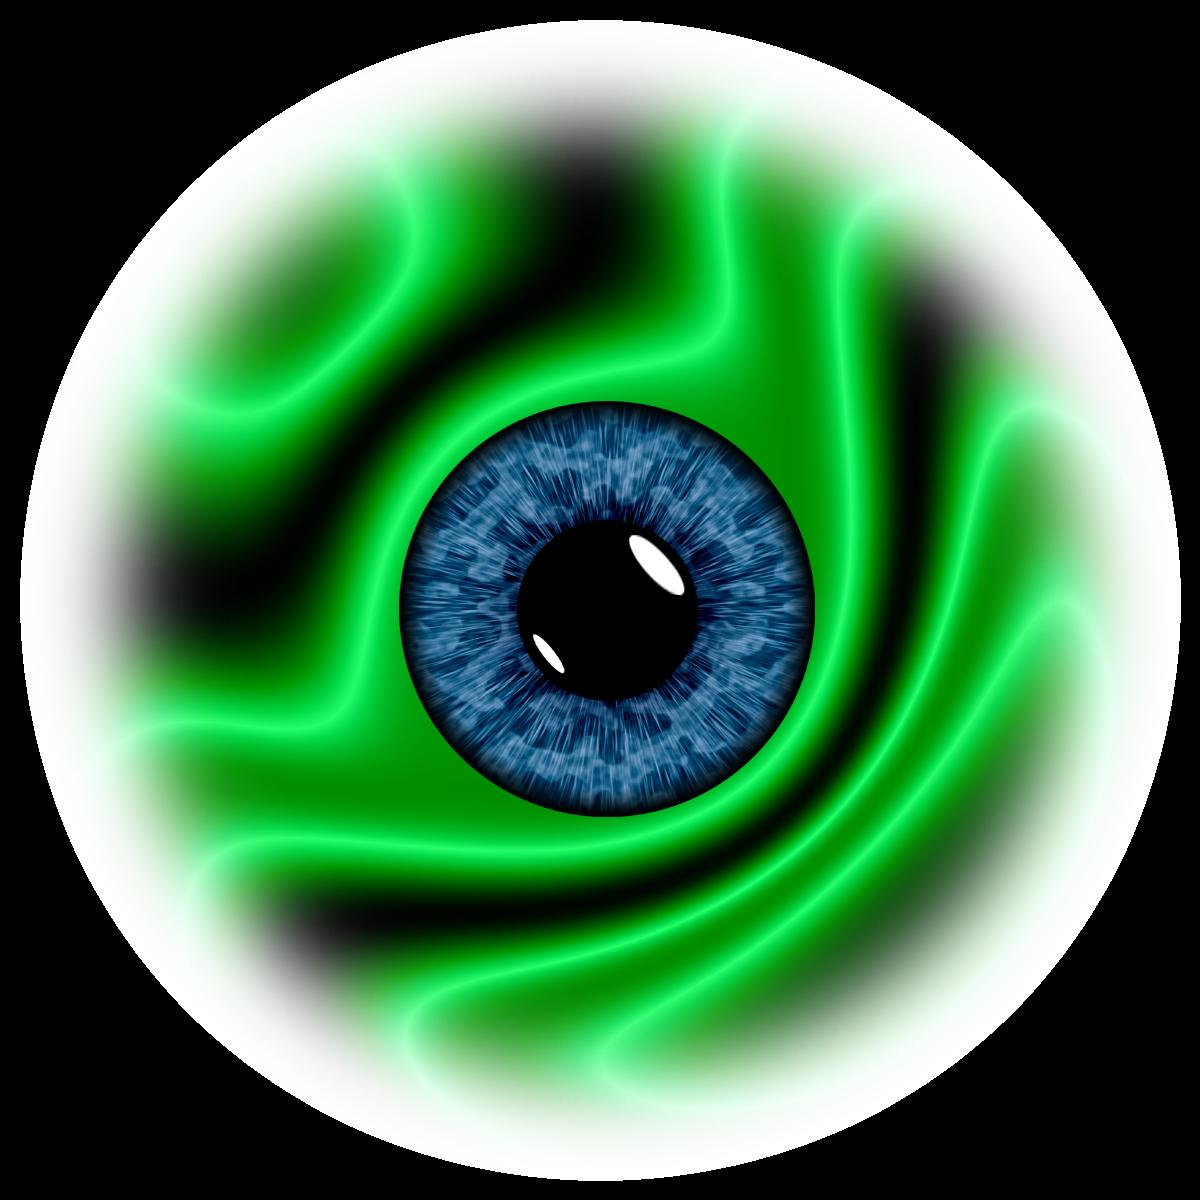 A Septic Eye free download jacksepticeye septic eye art [1200x1200] for